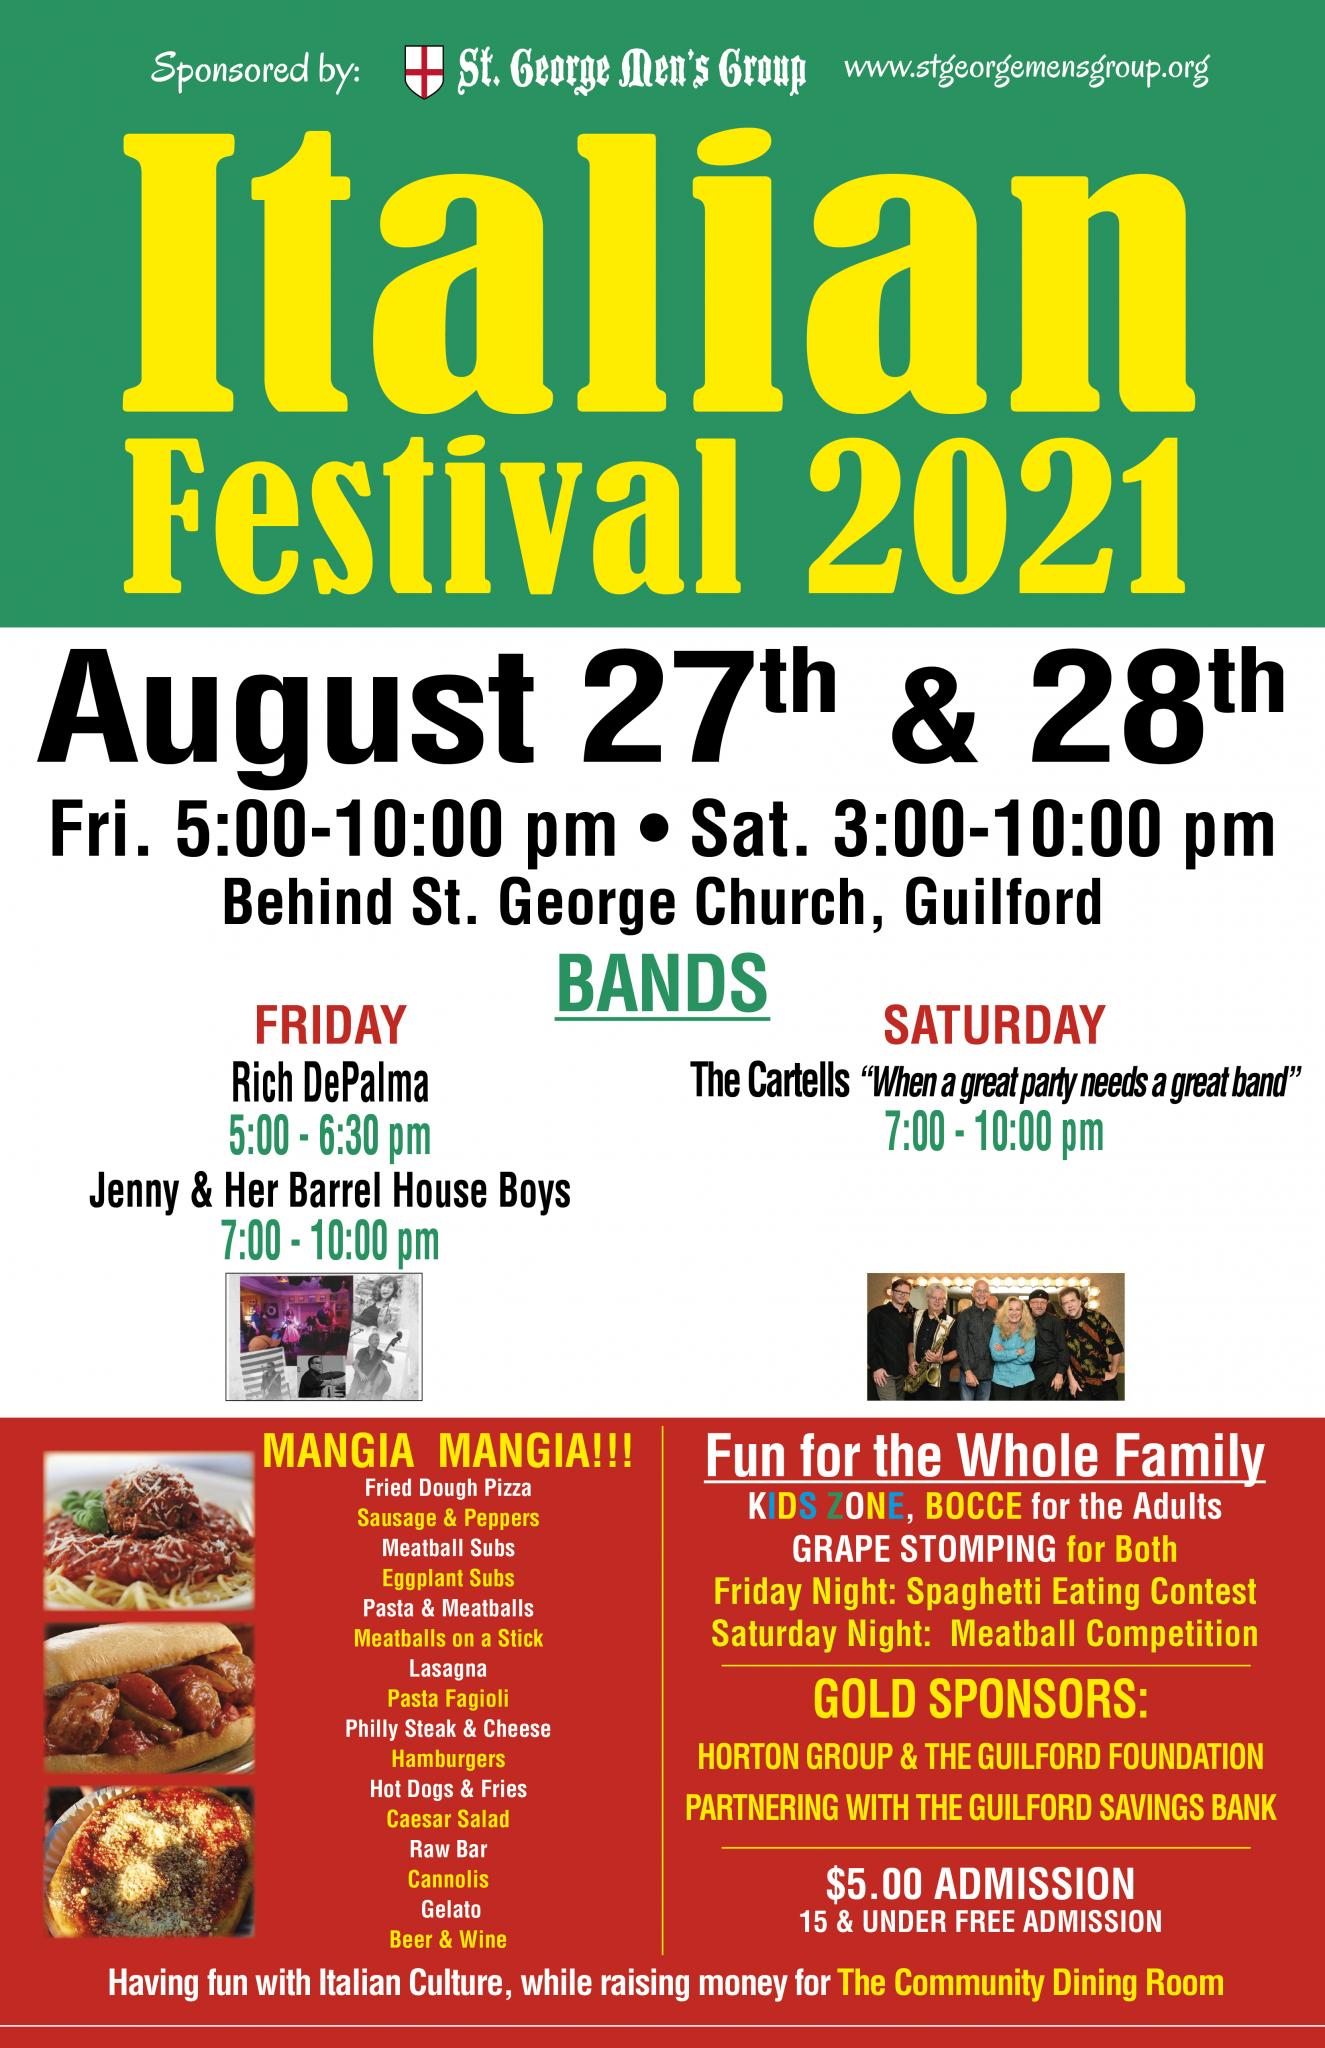 St. George Mens Group Italian Festival 2021